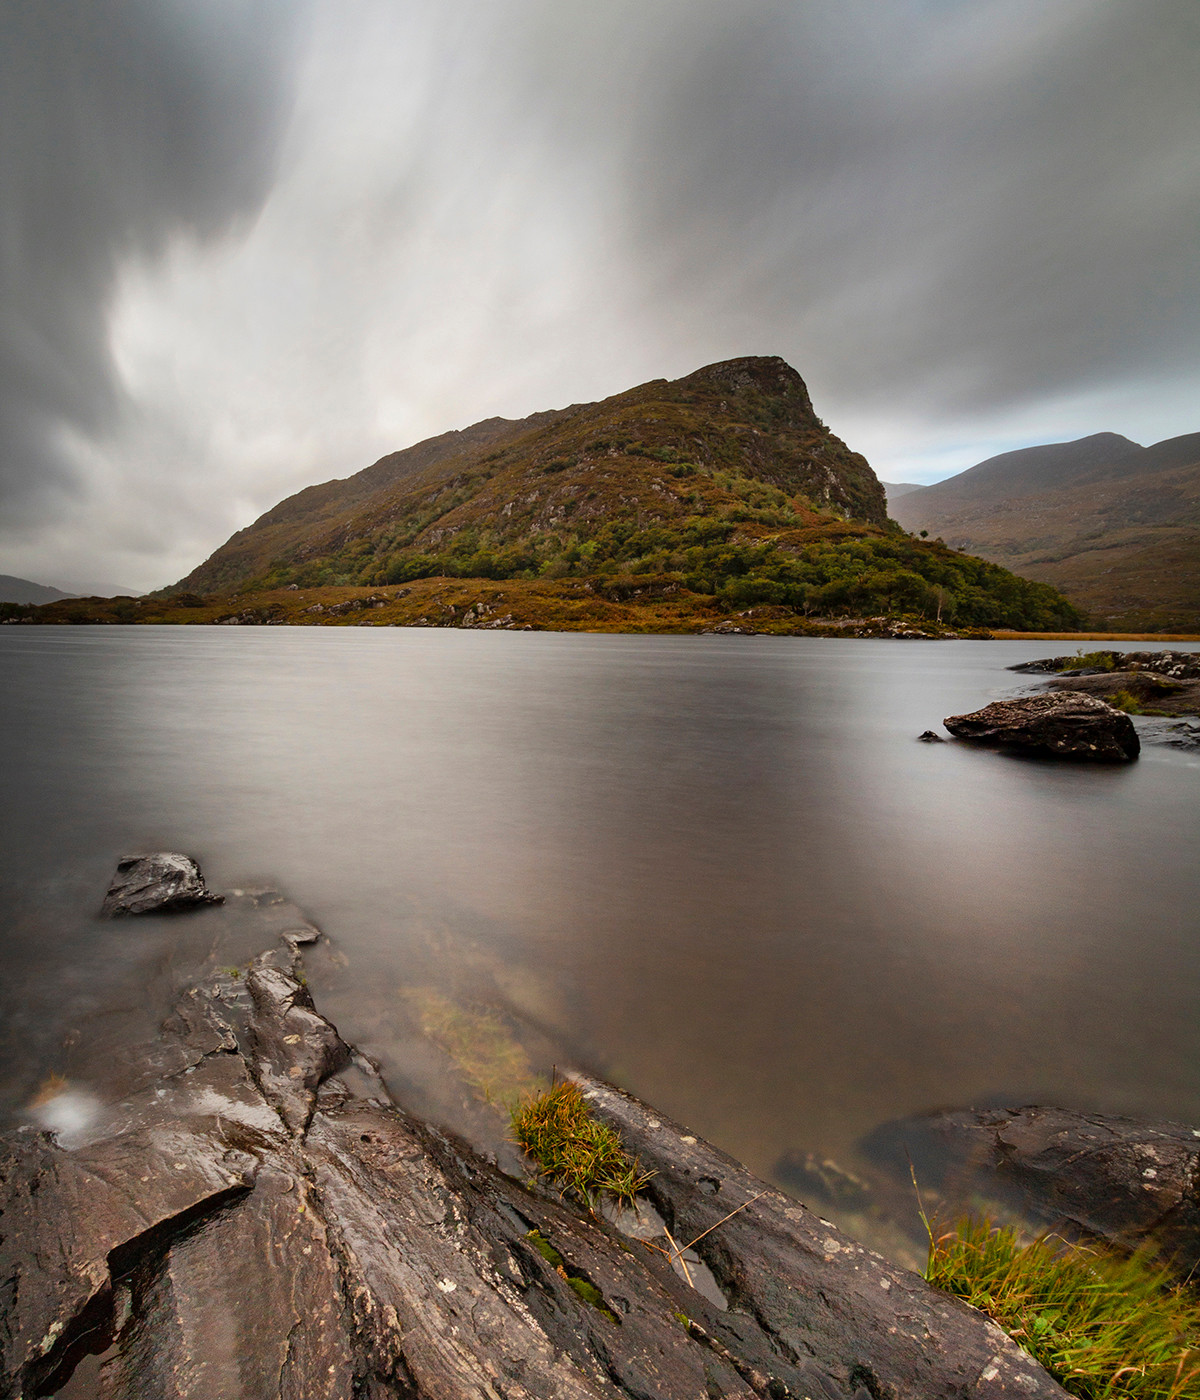 COLOUR - Killarney Lake by Robert McGlaughlin (9 marks)